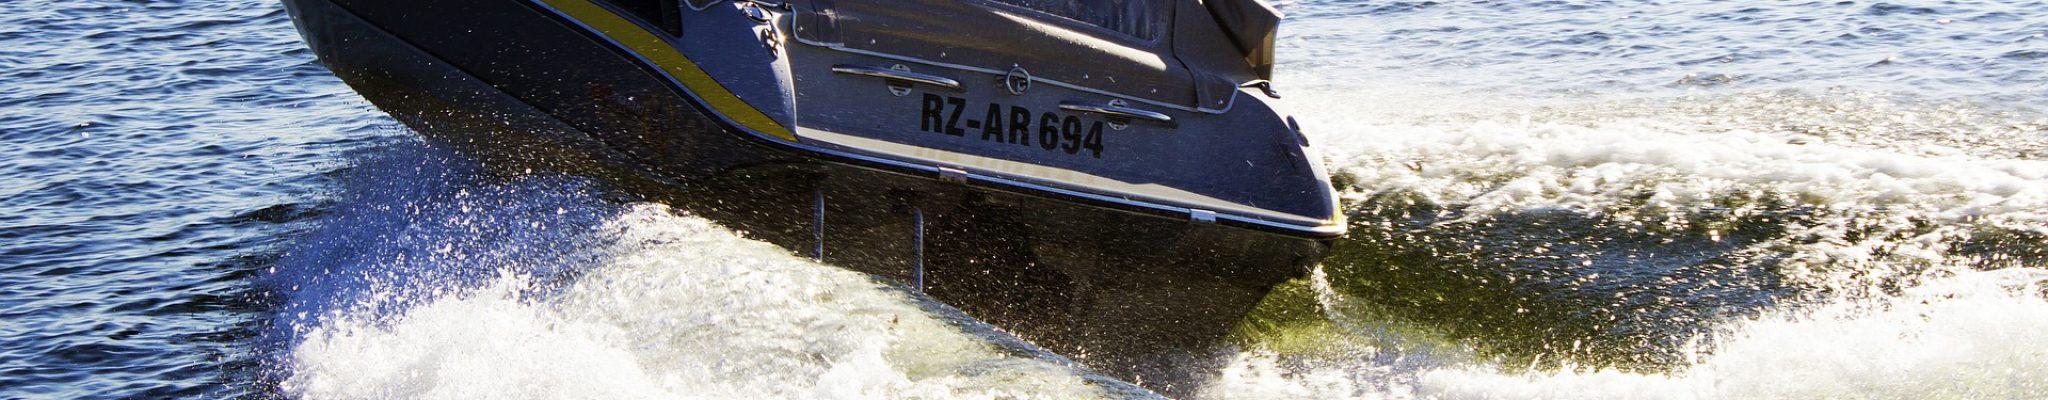 sport-boat-1579706_1920